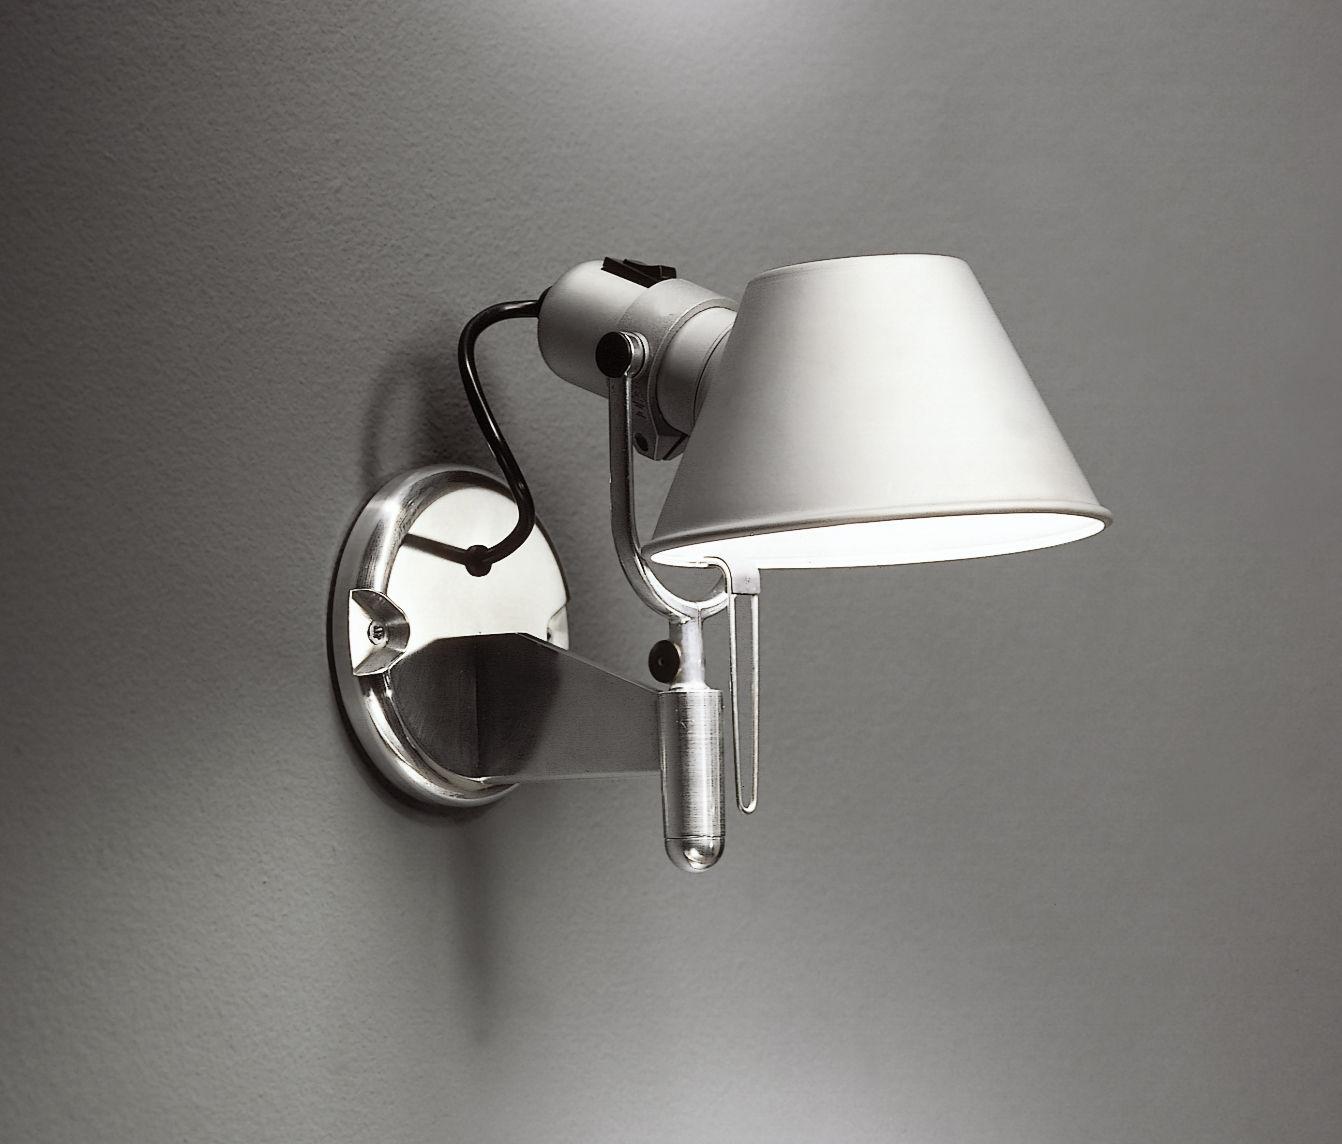 tolomeo faretto wall light aluminium by artemide. Black Bedroom Furniture Sets. Home Design Ideas